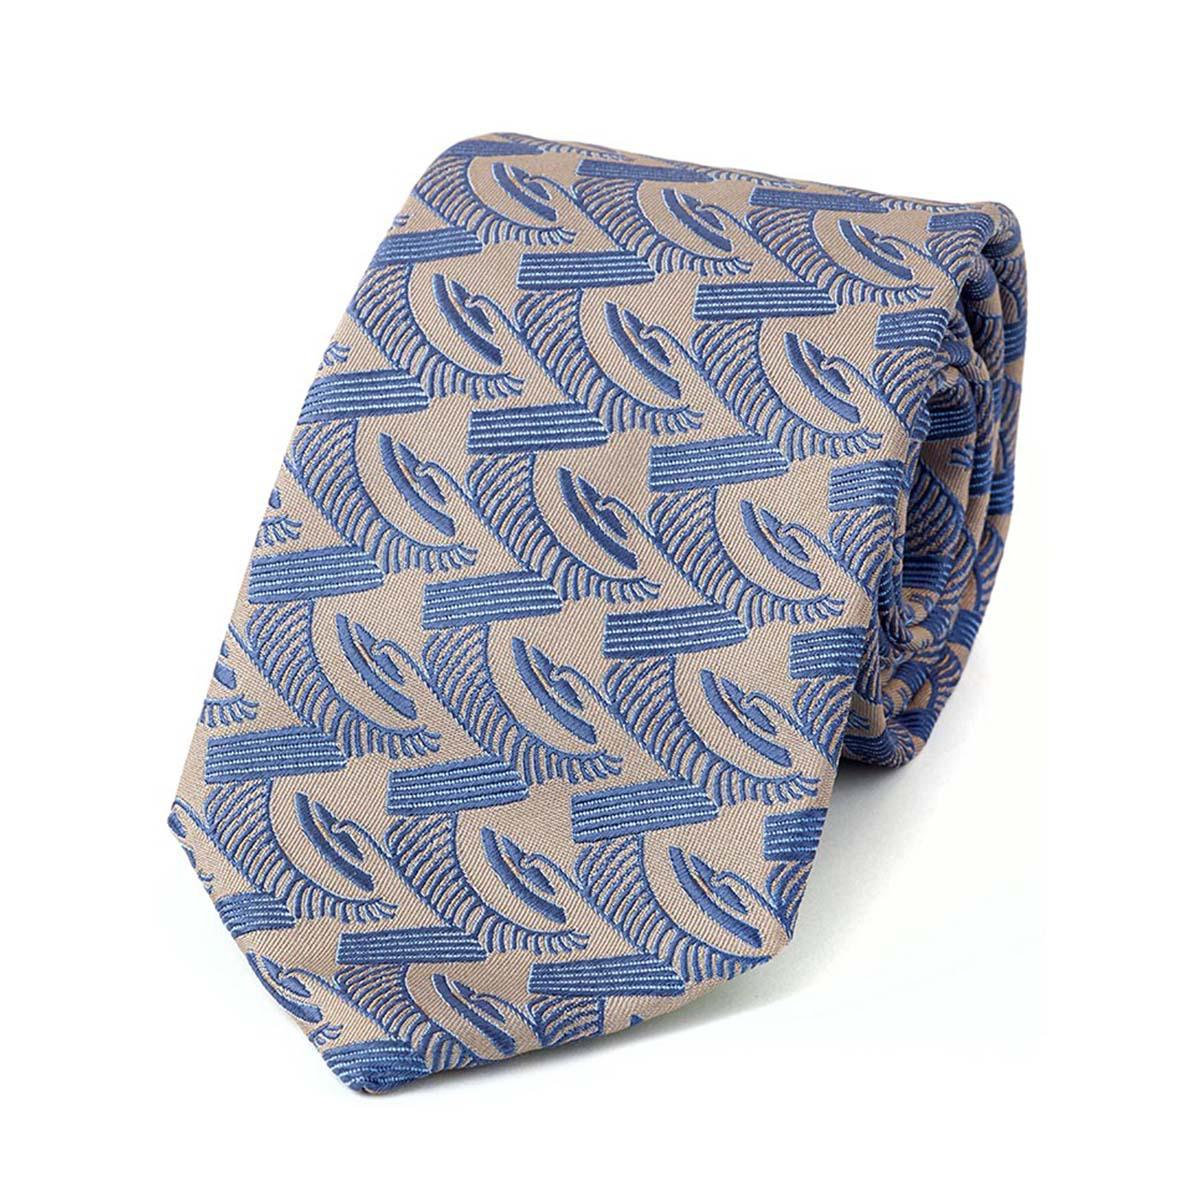 Sky and Navy Myan Silk Bow Tie Augustus Hare nPxs0YdKrw